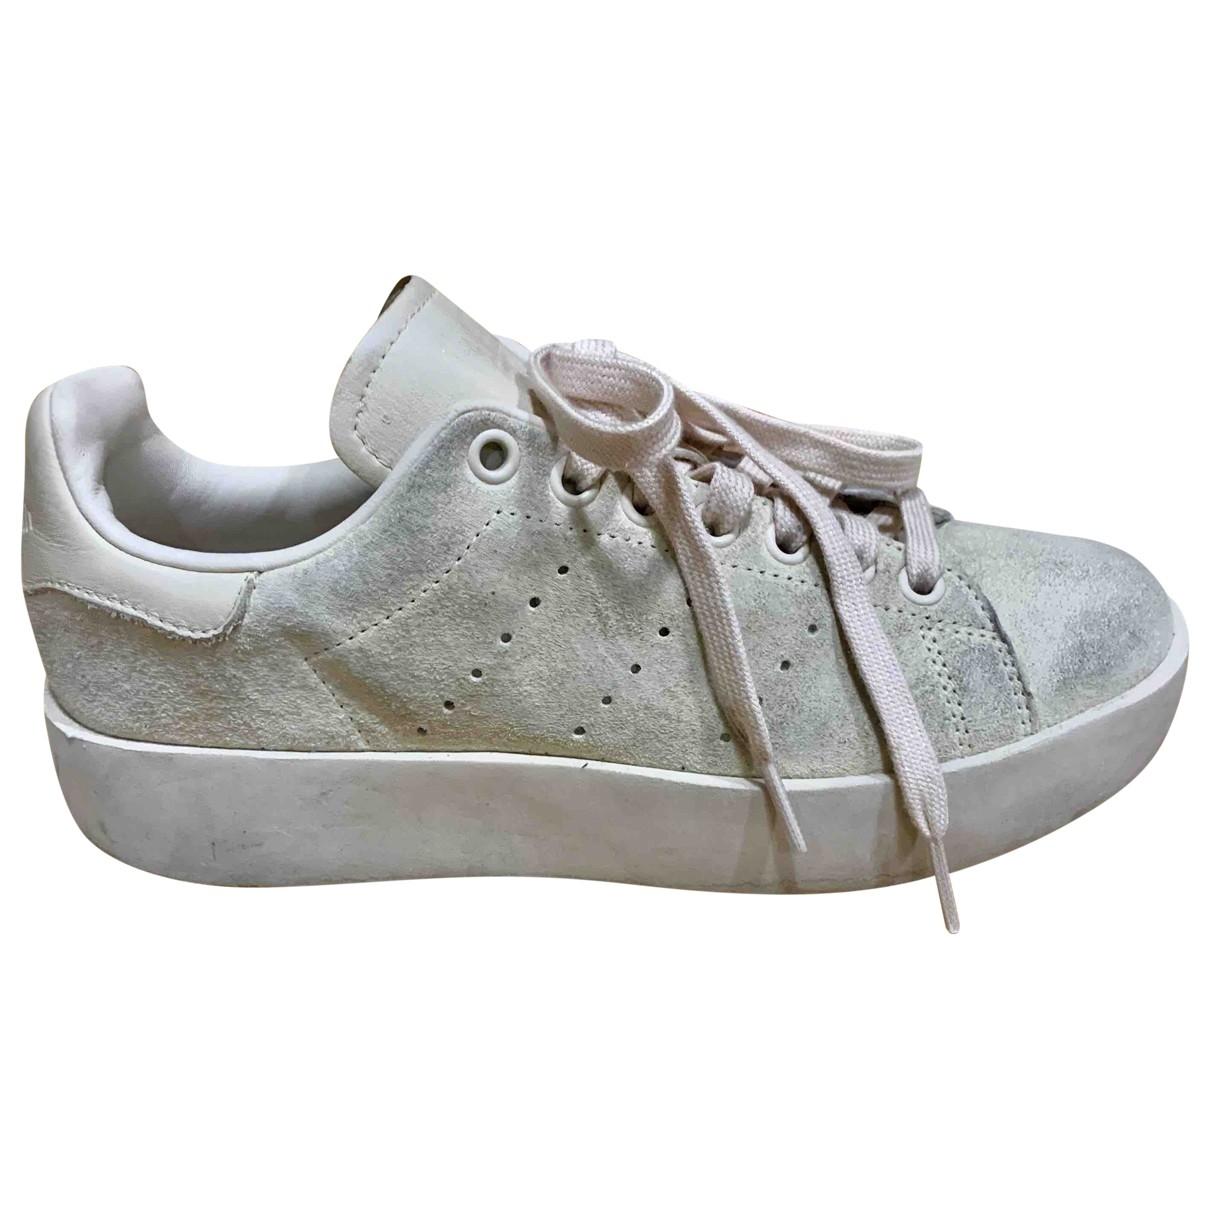 Adidas - Baskets Stan Smith pour femme en suede - rose